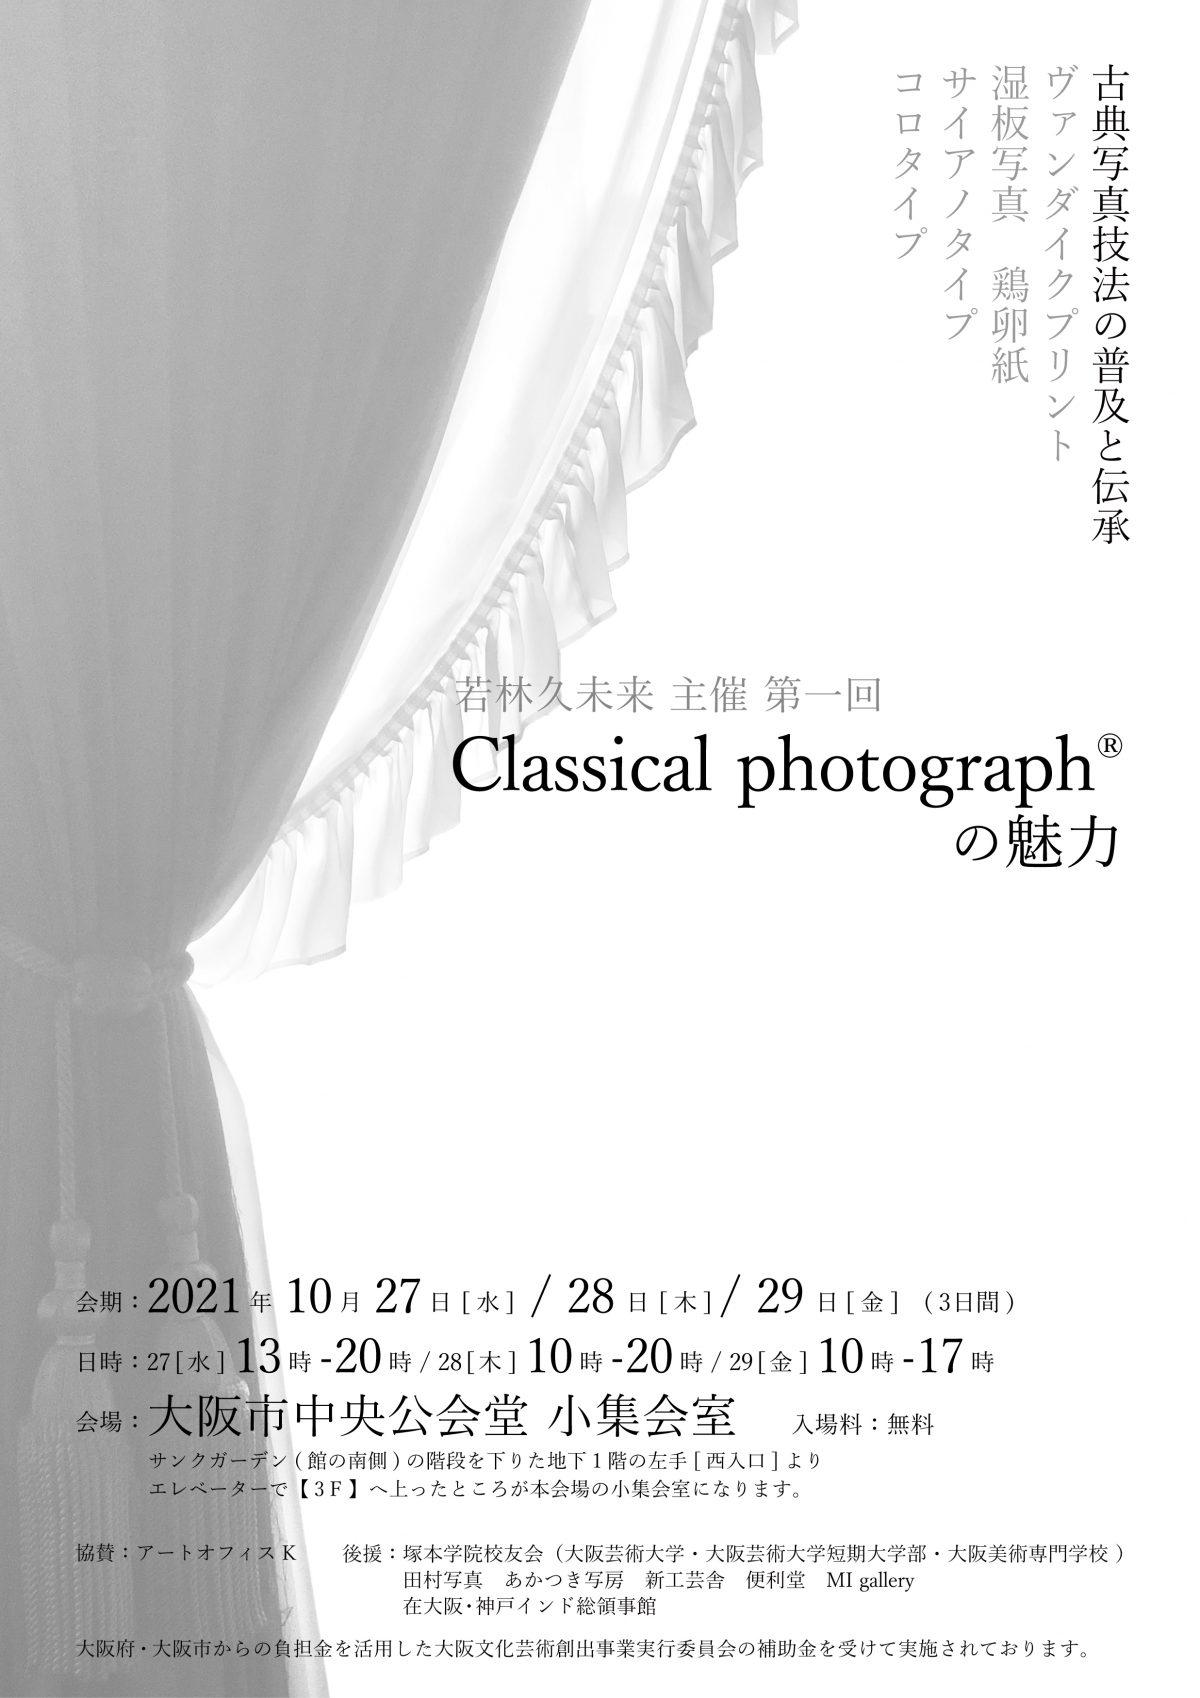 2021.10.27(水)〜10.29(金) Classical photograph®︎の魅力 出展